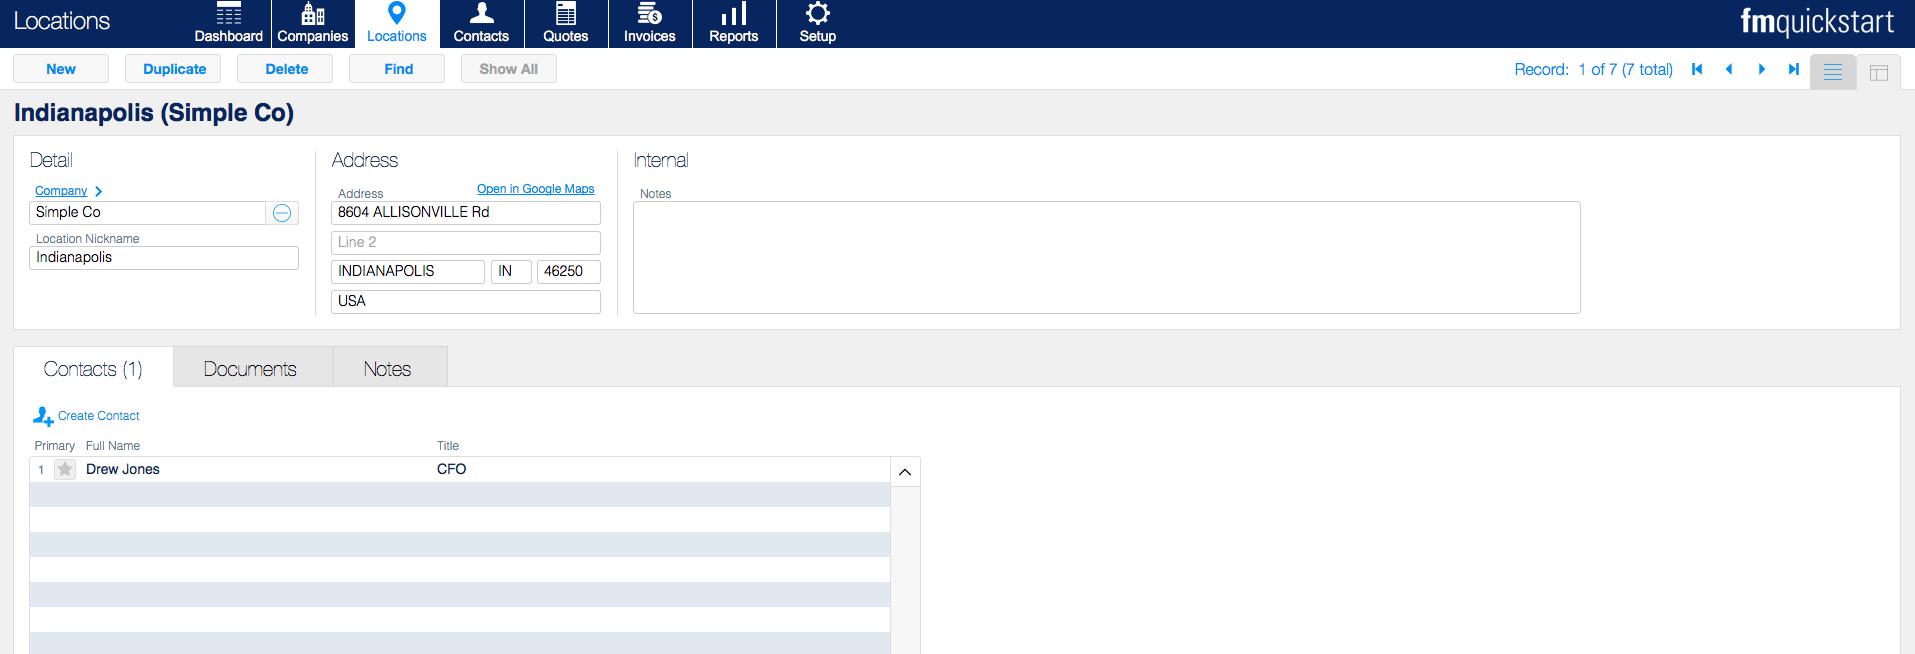 fm quickstart 17 locations